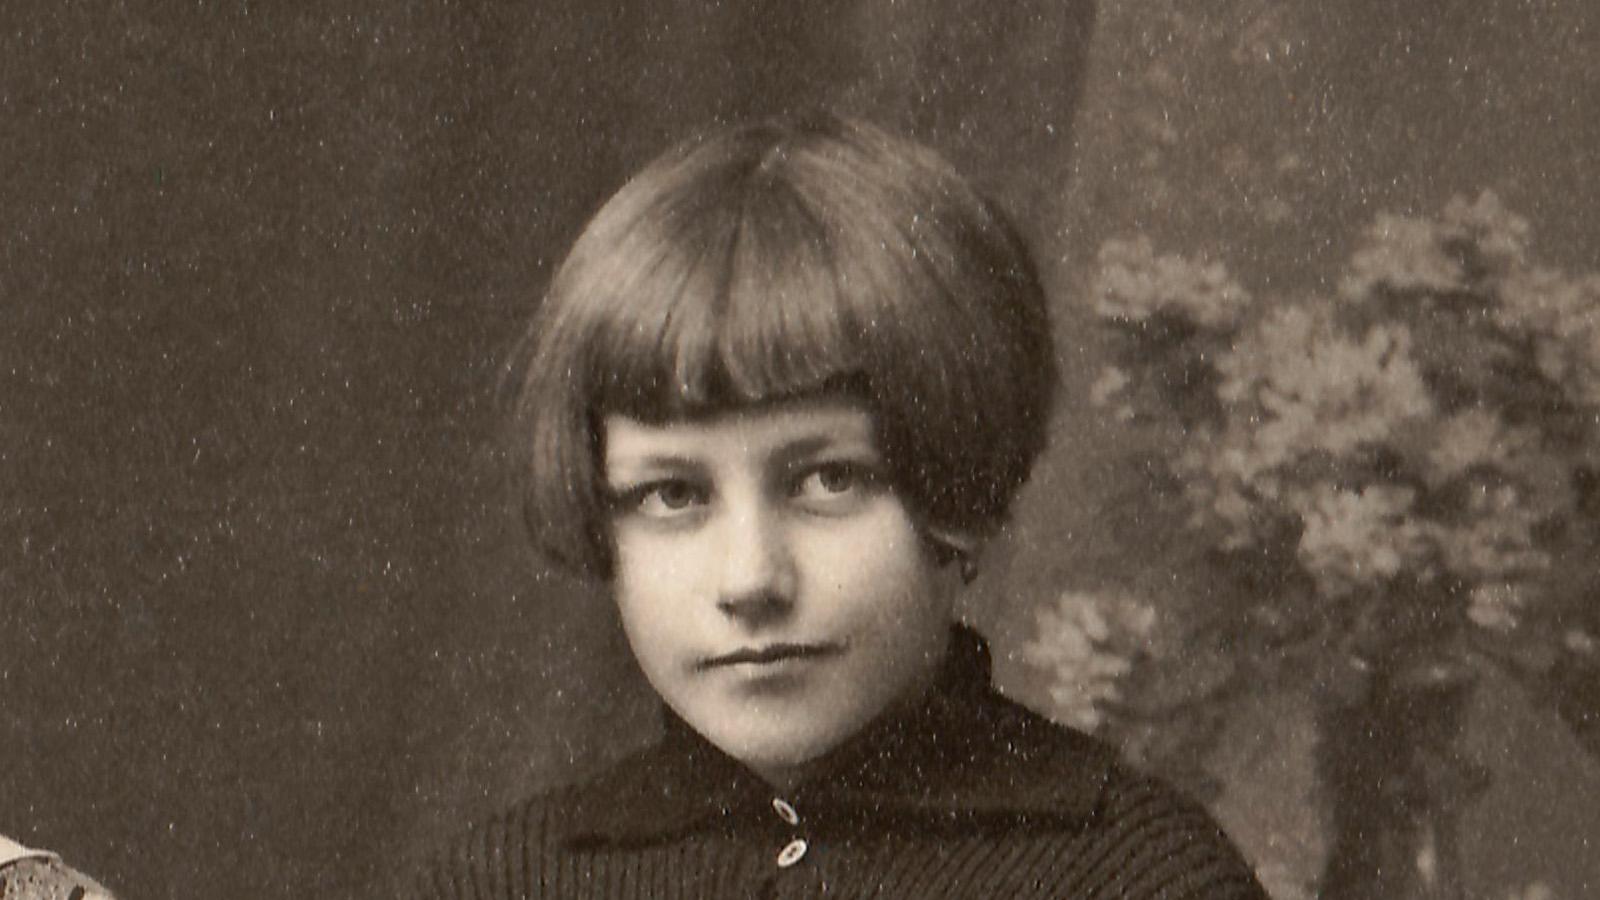 1928-anna-hildegard-gruppe-detail.jpg